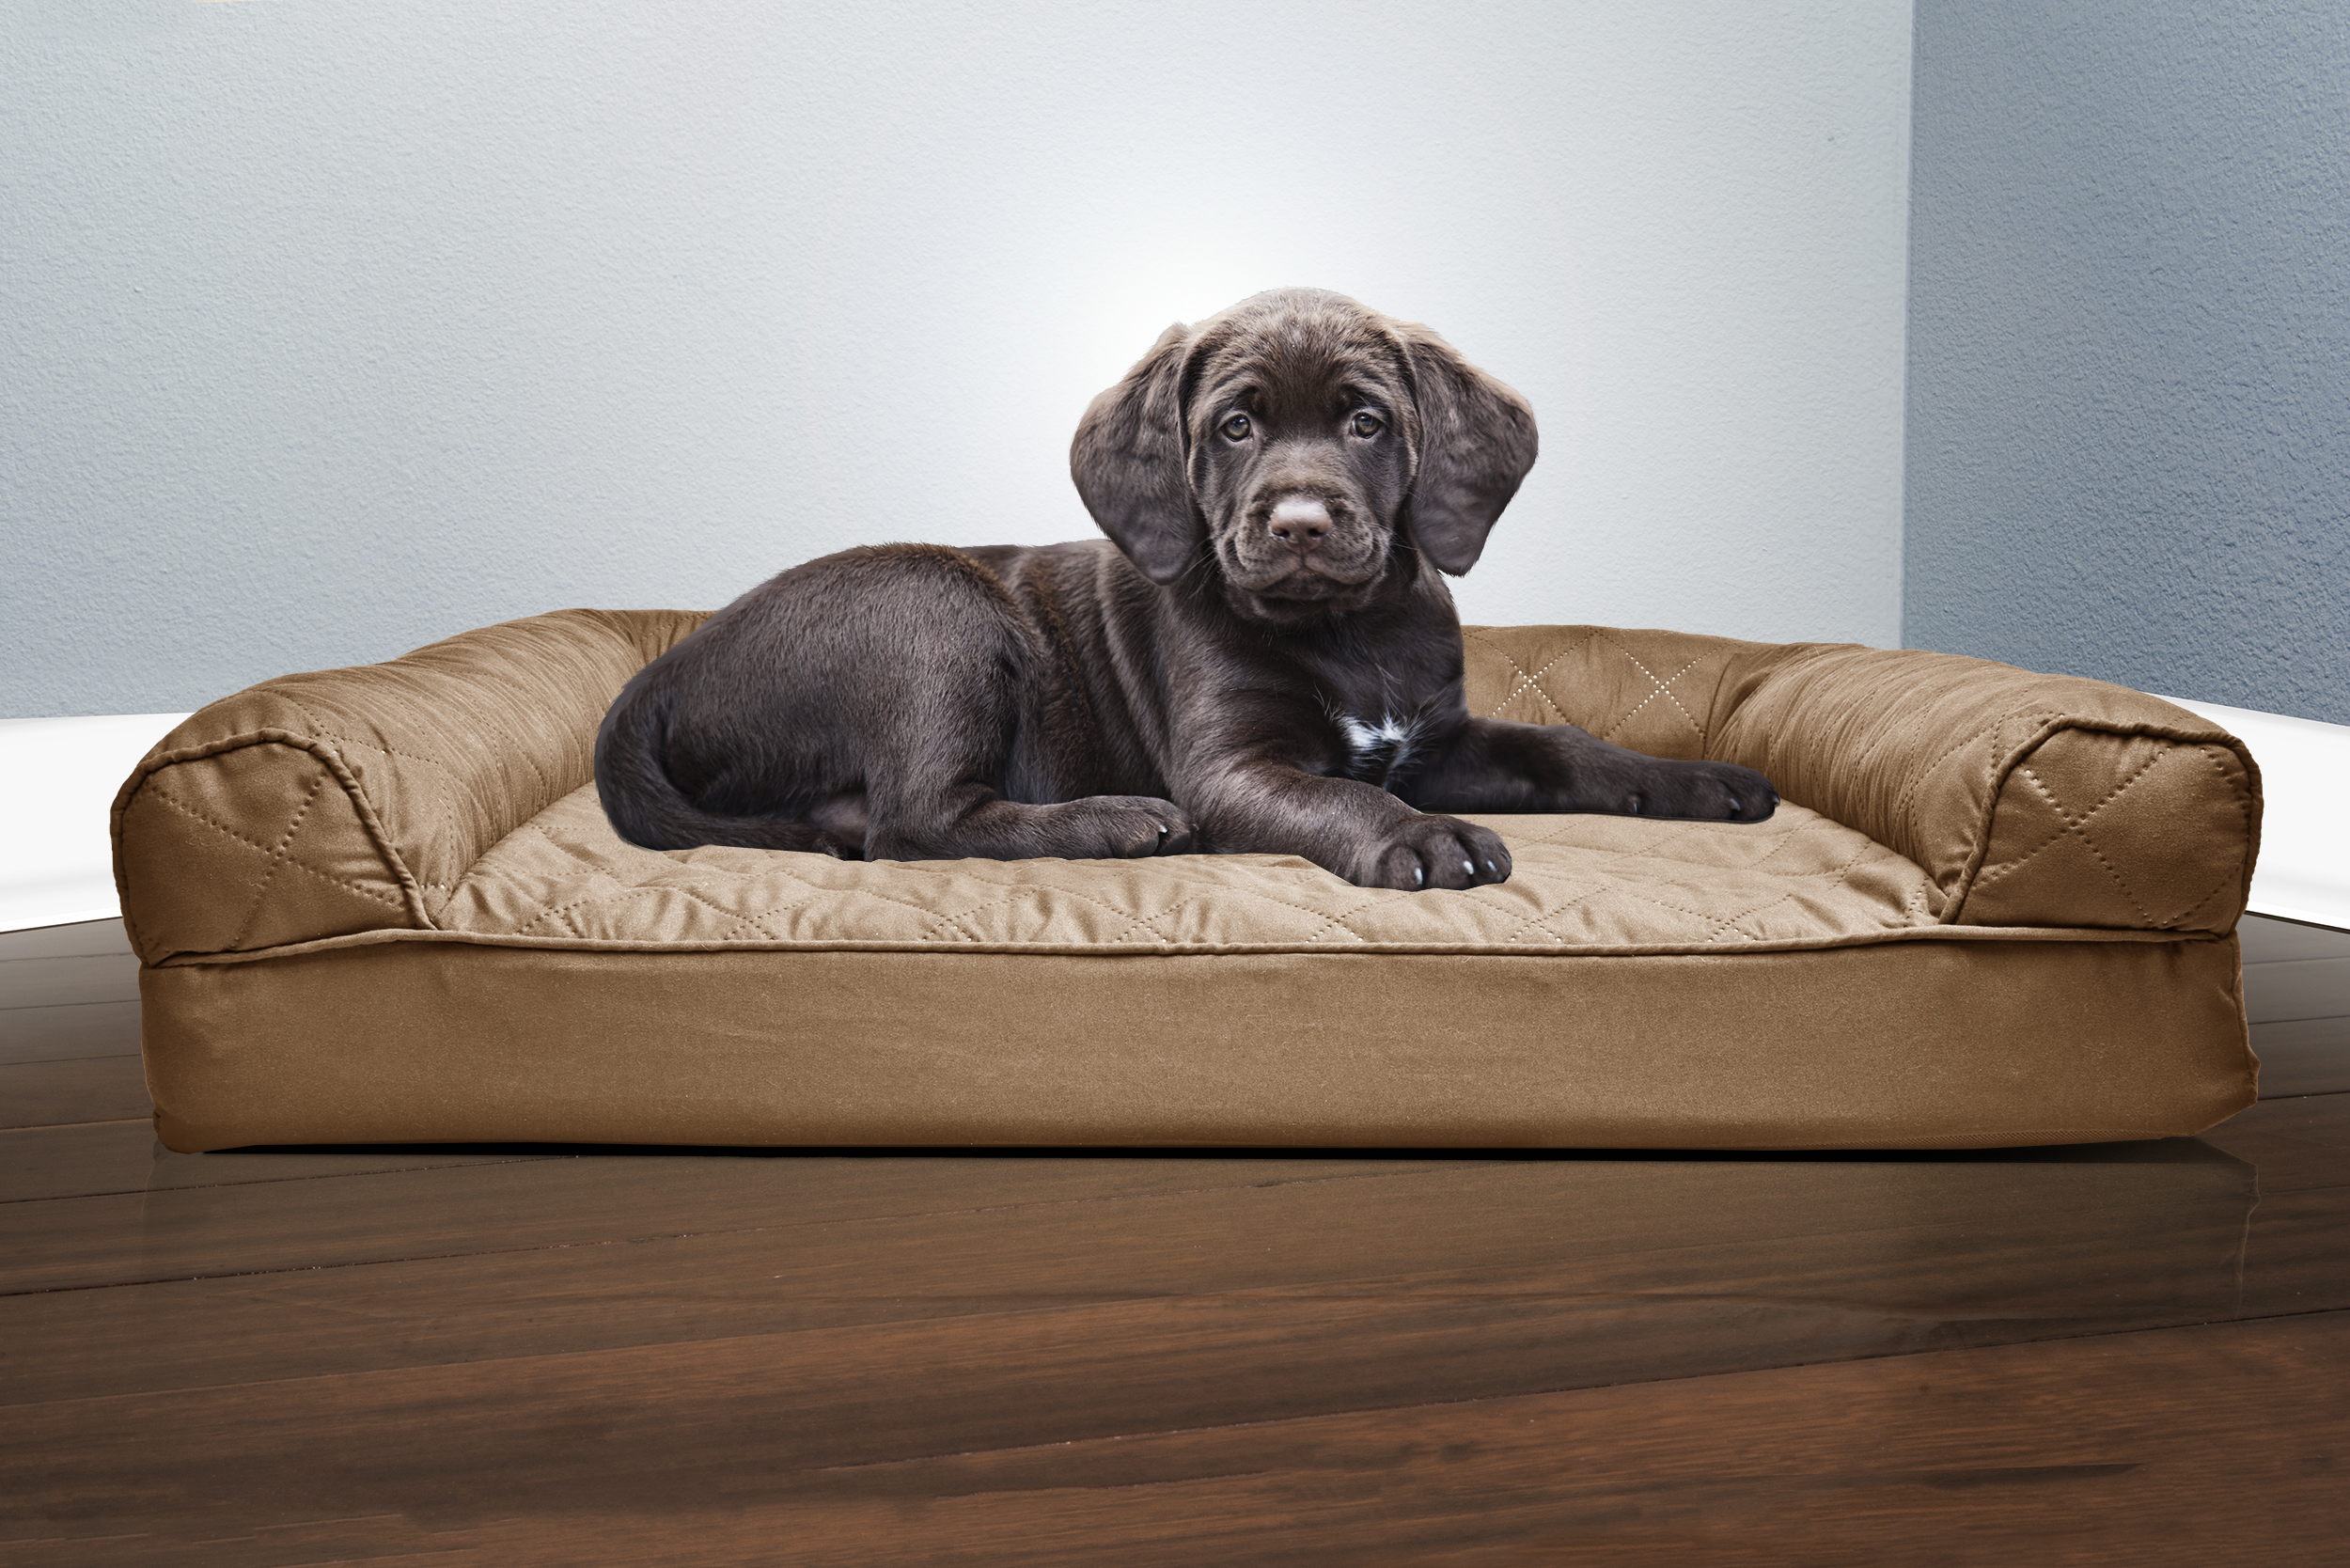 new furhaven quilted sofa dog bed pet bed warm brown. Black Bedroom Furniture Sets. Home Design Ideas